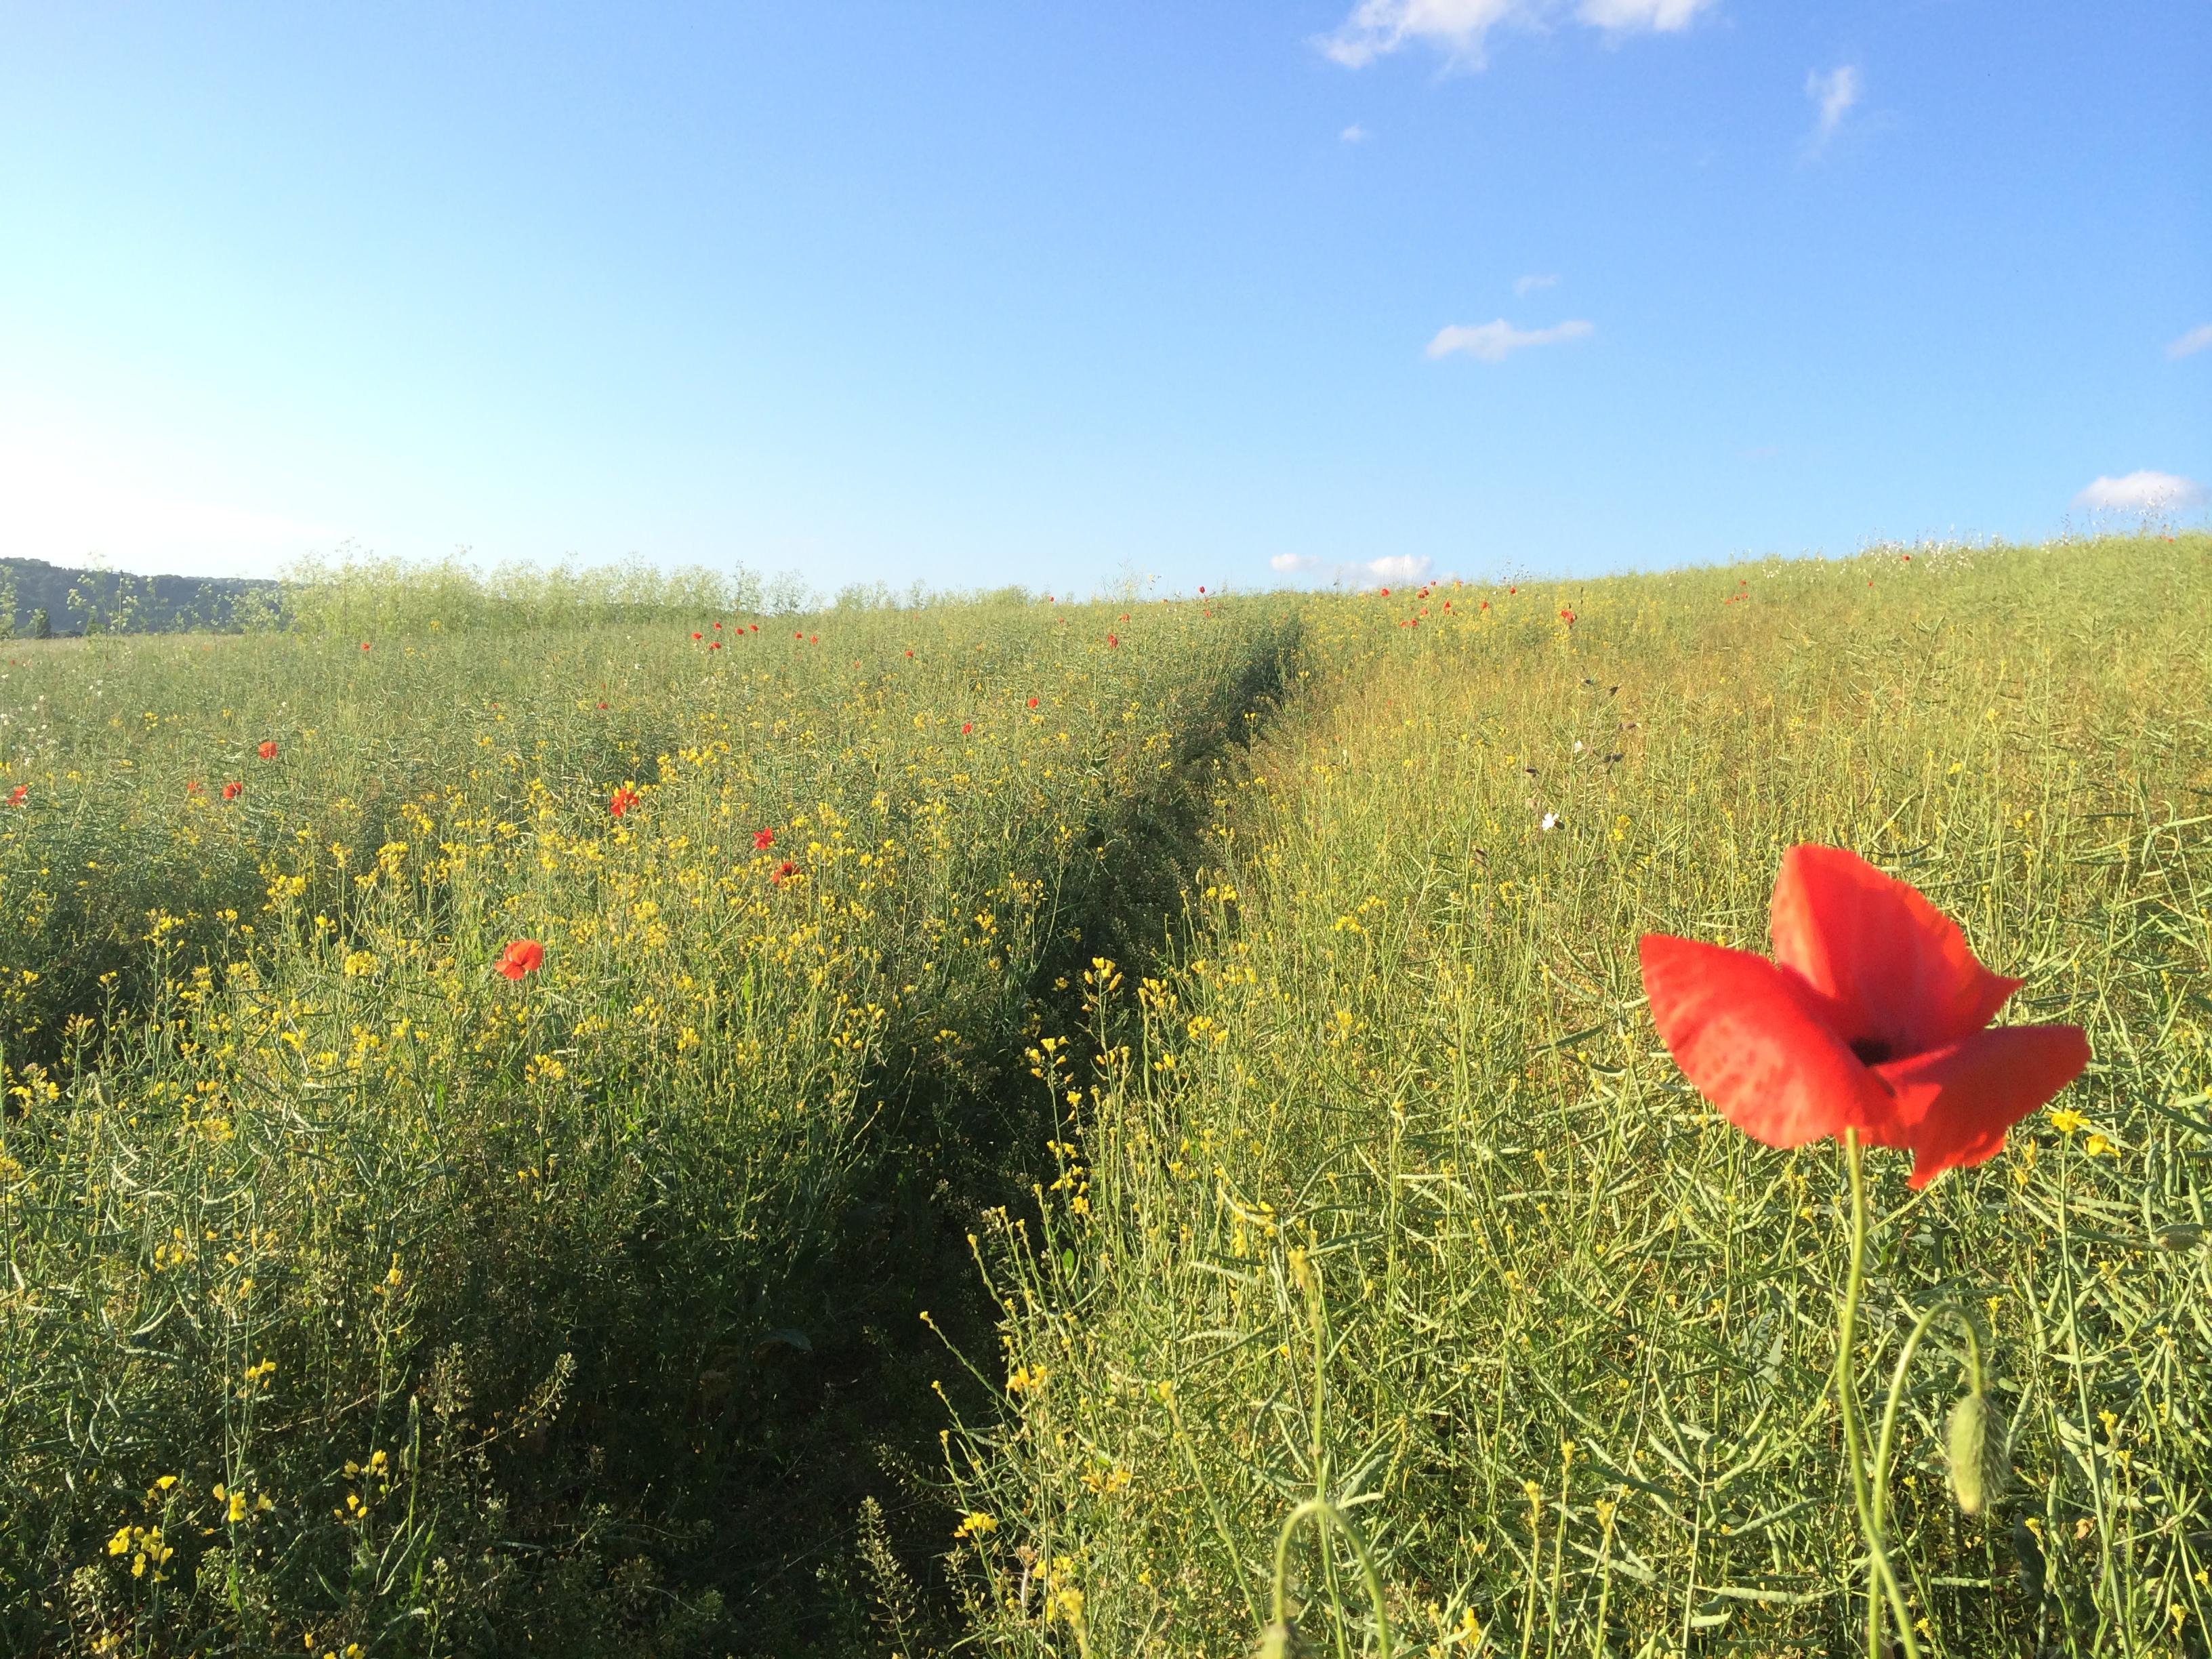 The Poppy Fields at Henley - better than a hangover